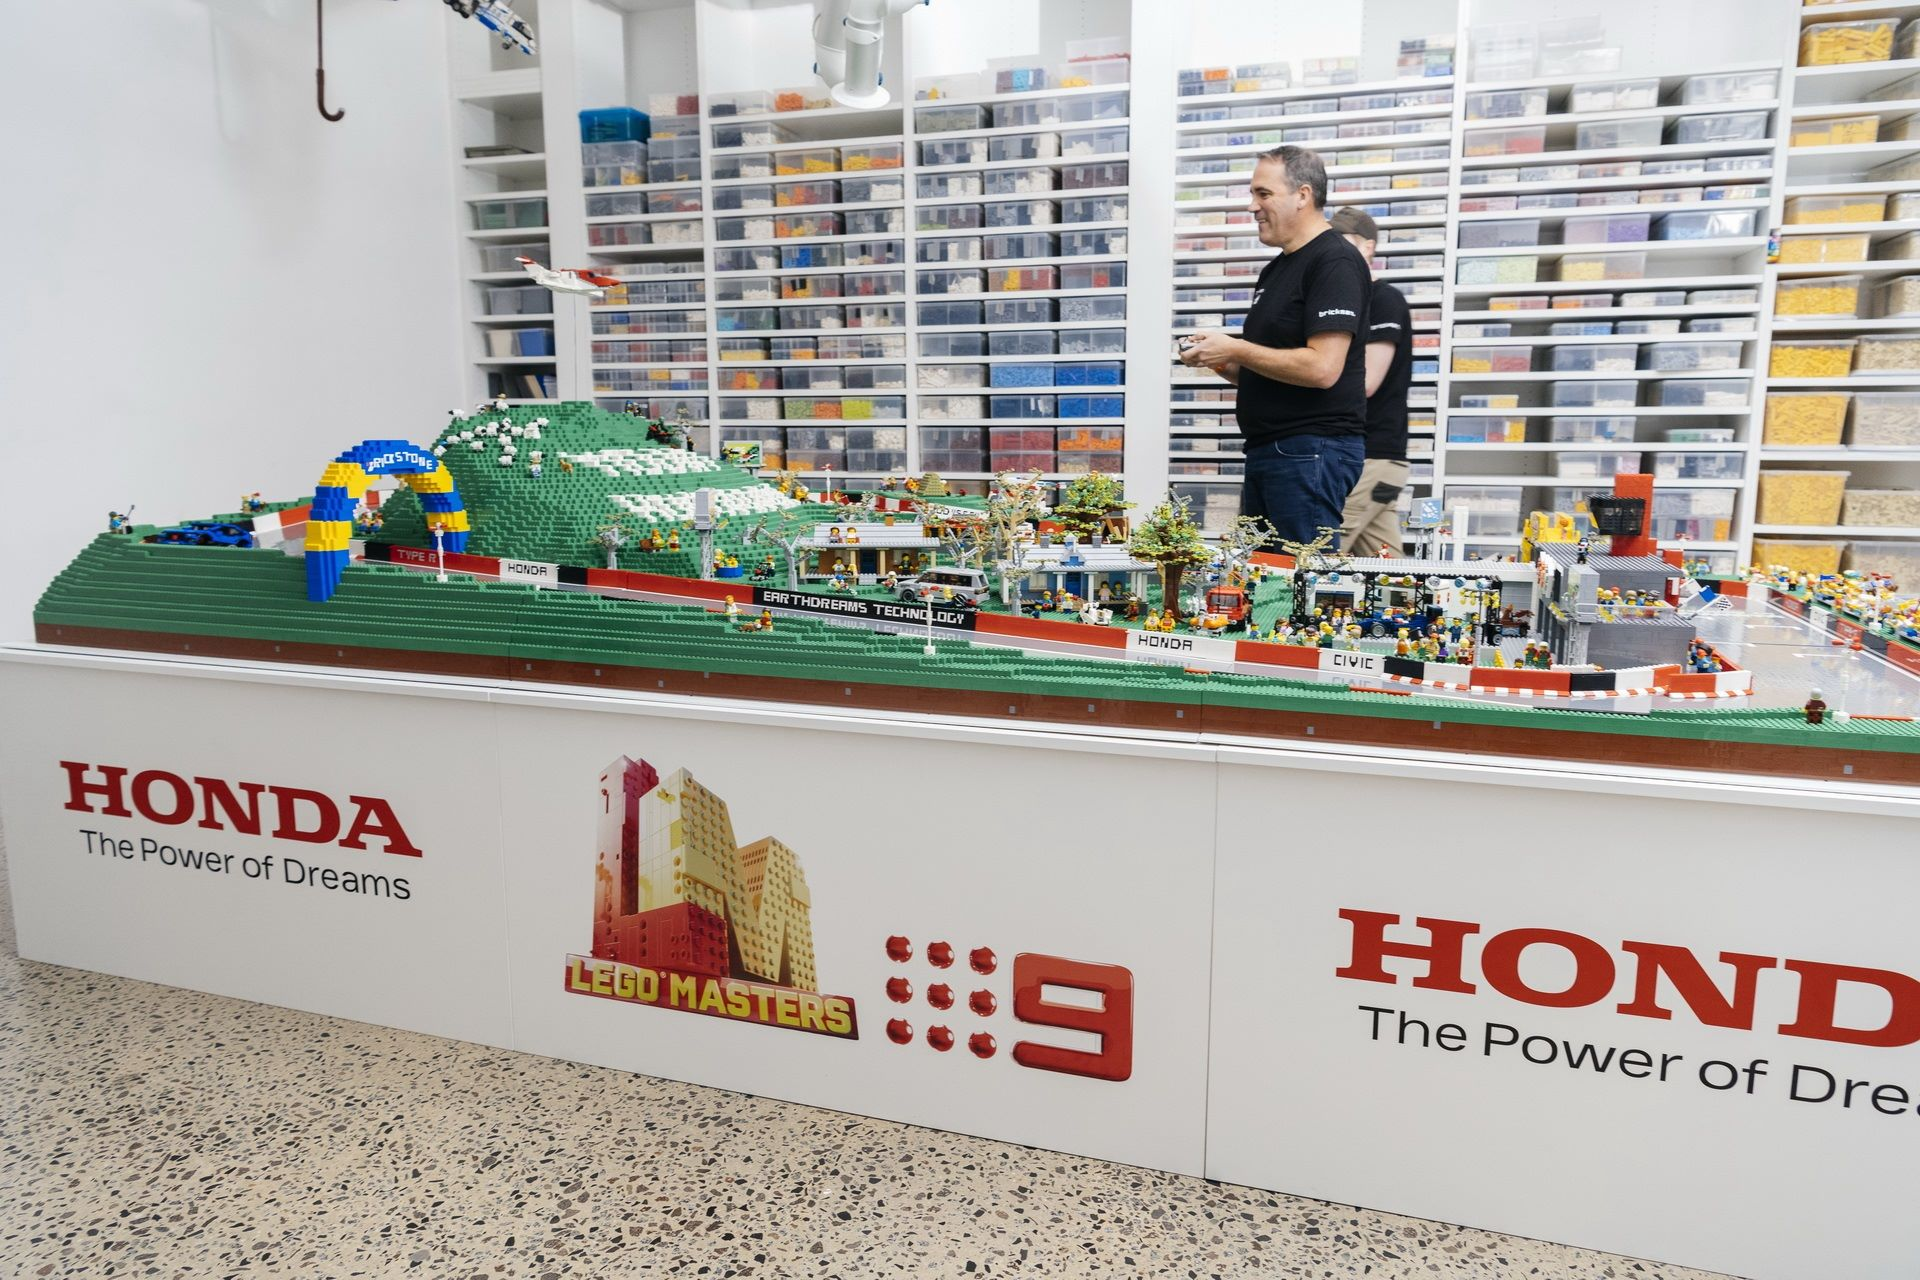 Honda-mount-panorama-bathurst-australia-lego-1